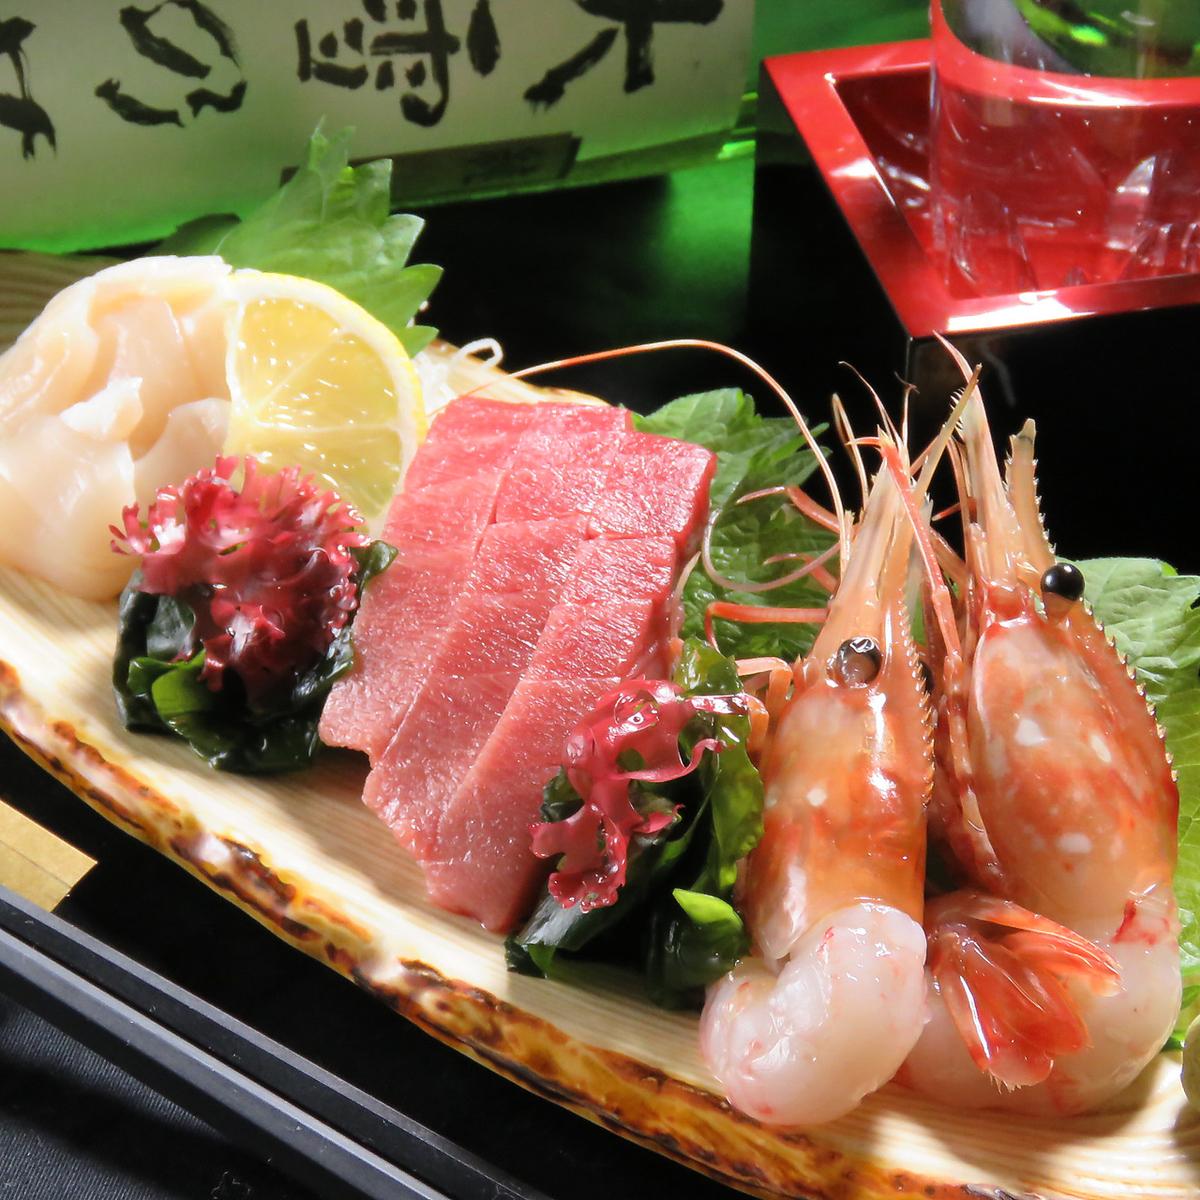 Three sashimi rolls (one serving)